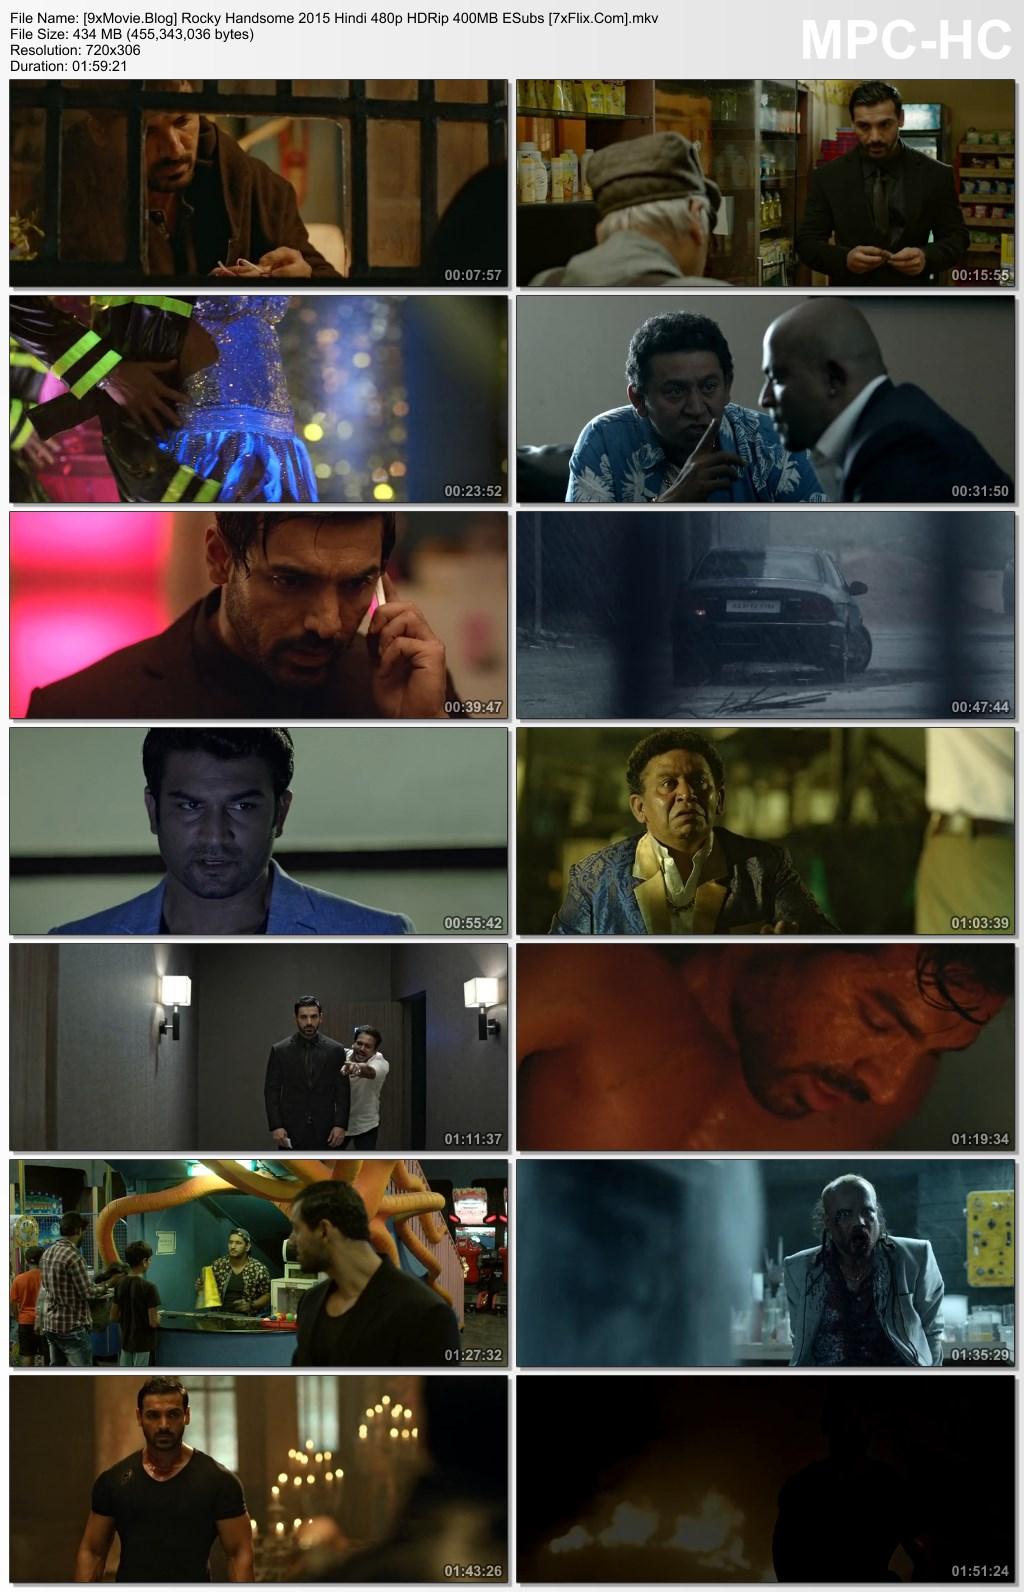 Rocky Handsome 2016 Hindi 480p HDRip x264 400MB ESubs